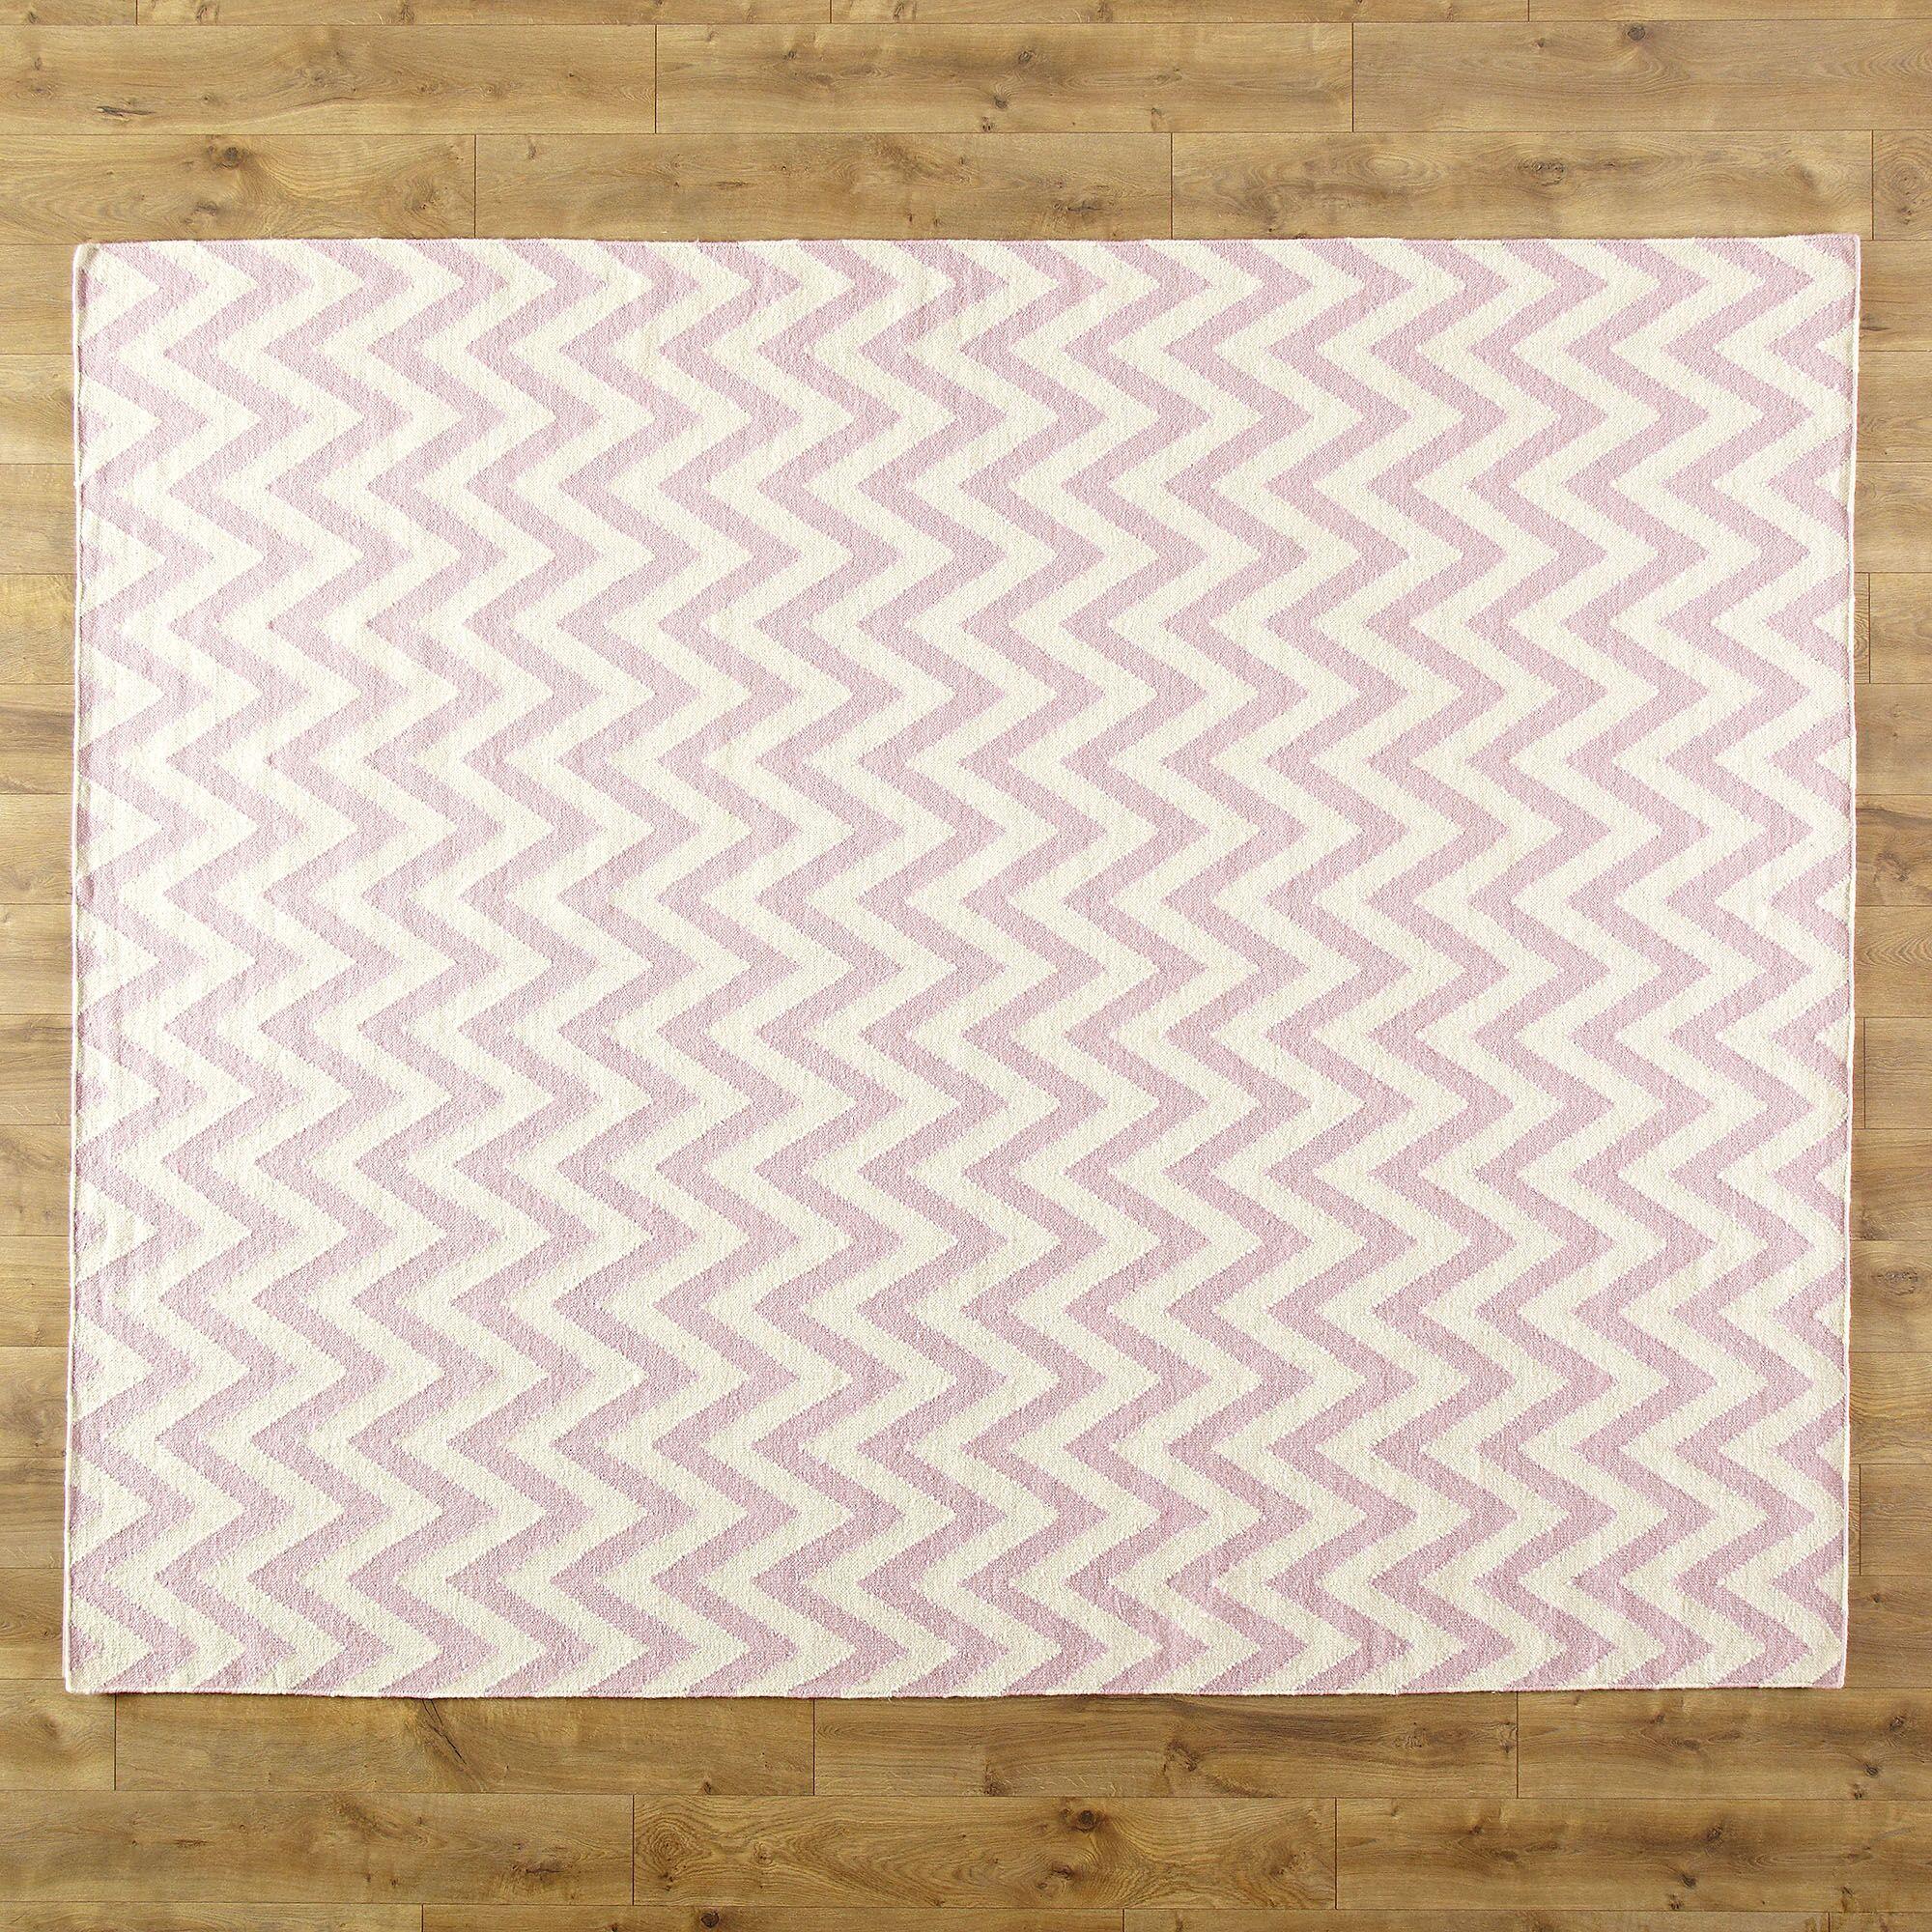 Moves Like Zigzagger Pink Area Rug Rug Size: Rectangle 10' x 14'